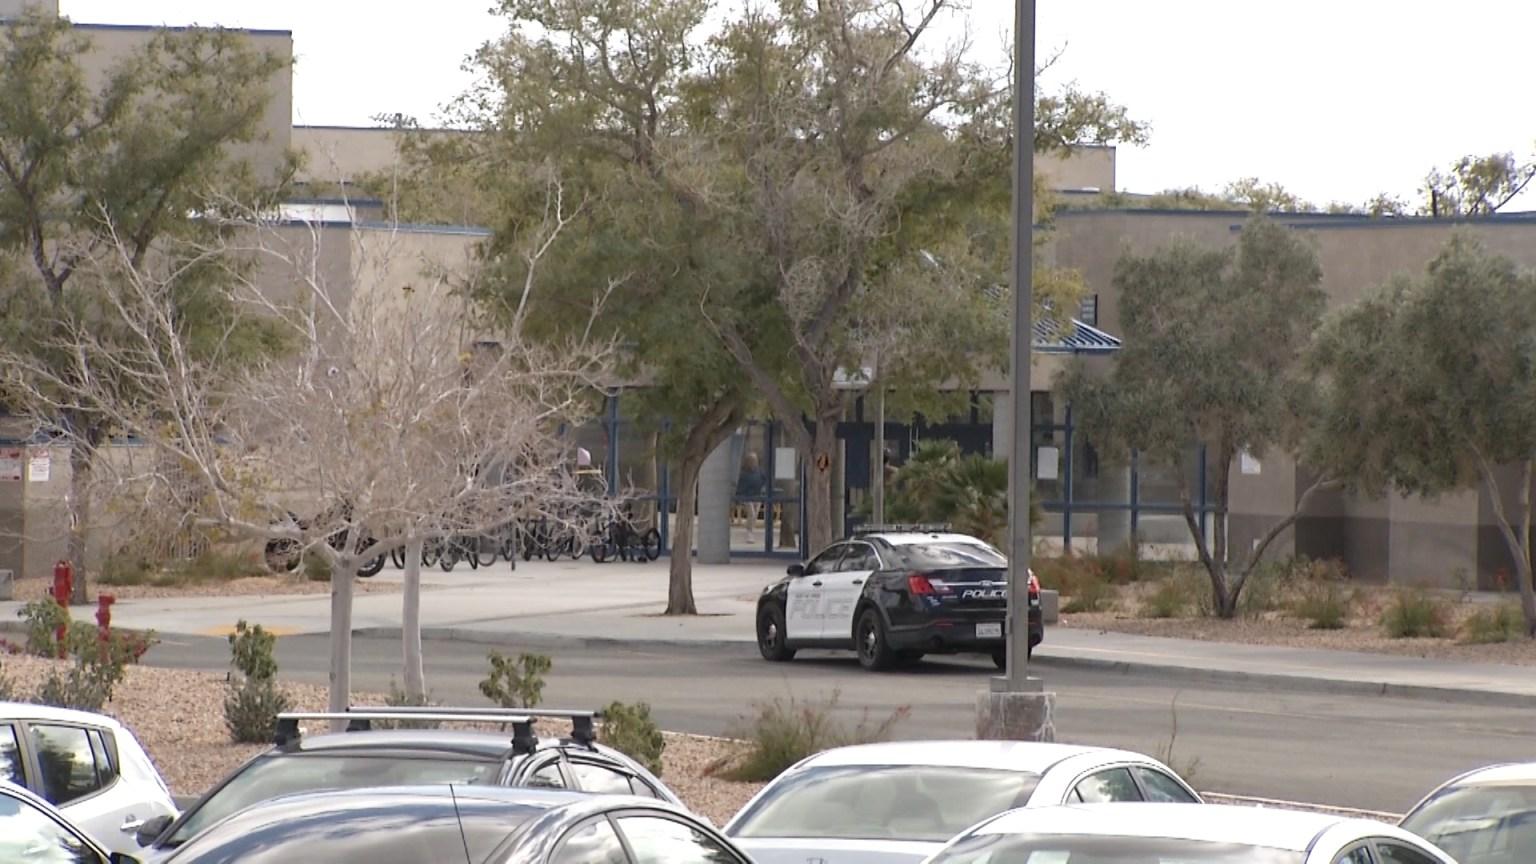 Parents Voice Concern Over School Violence